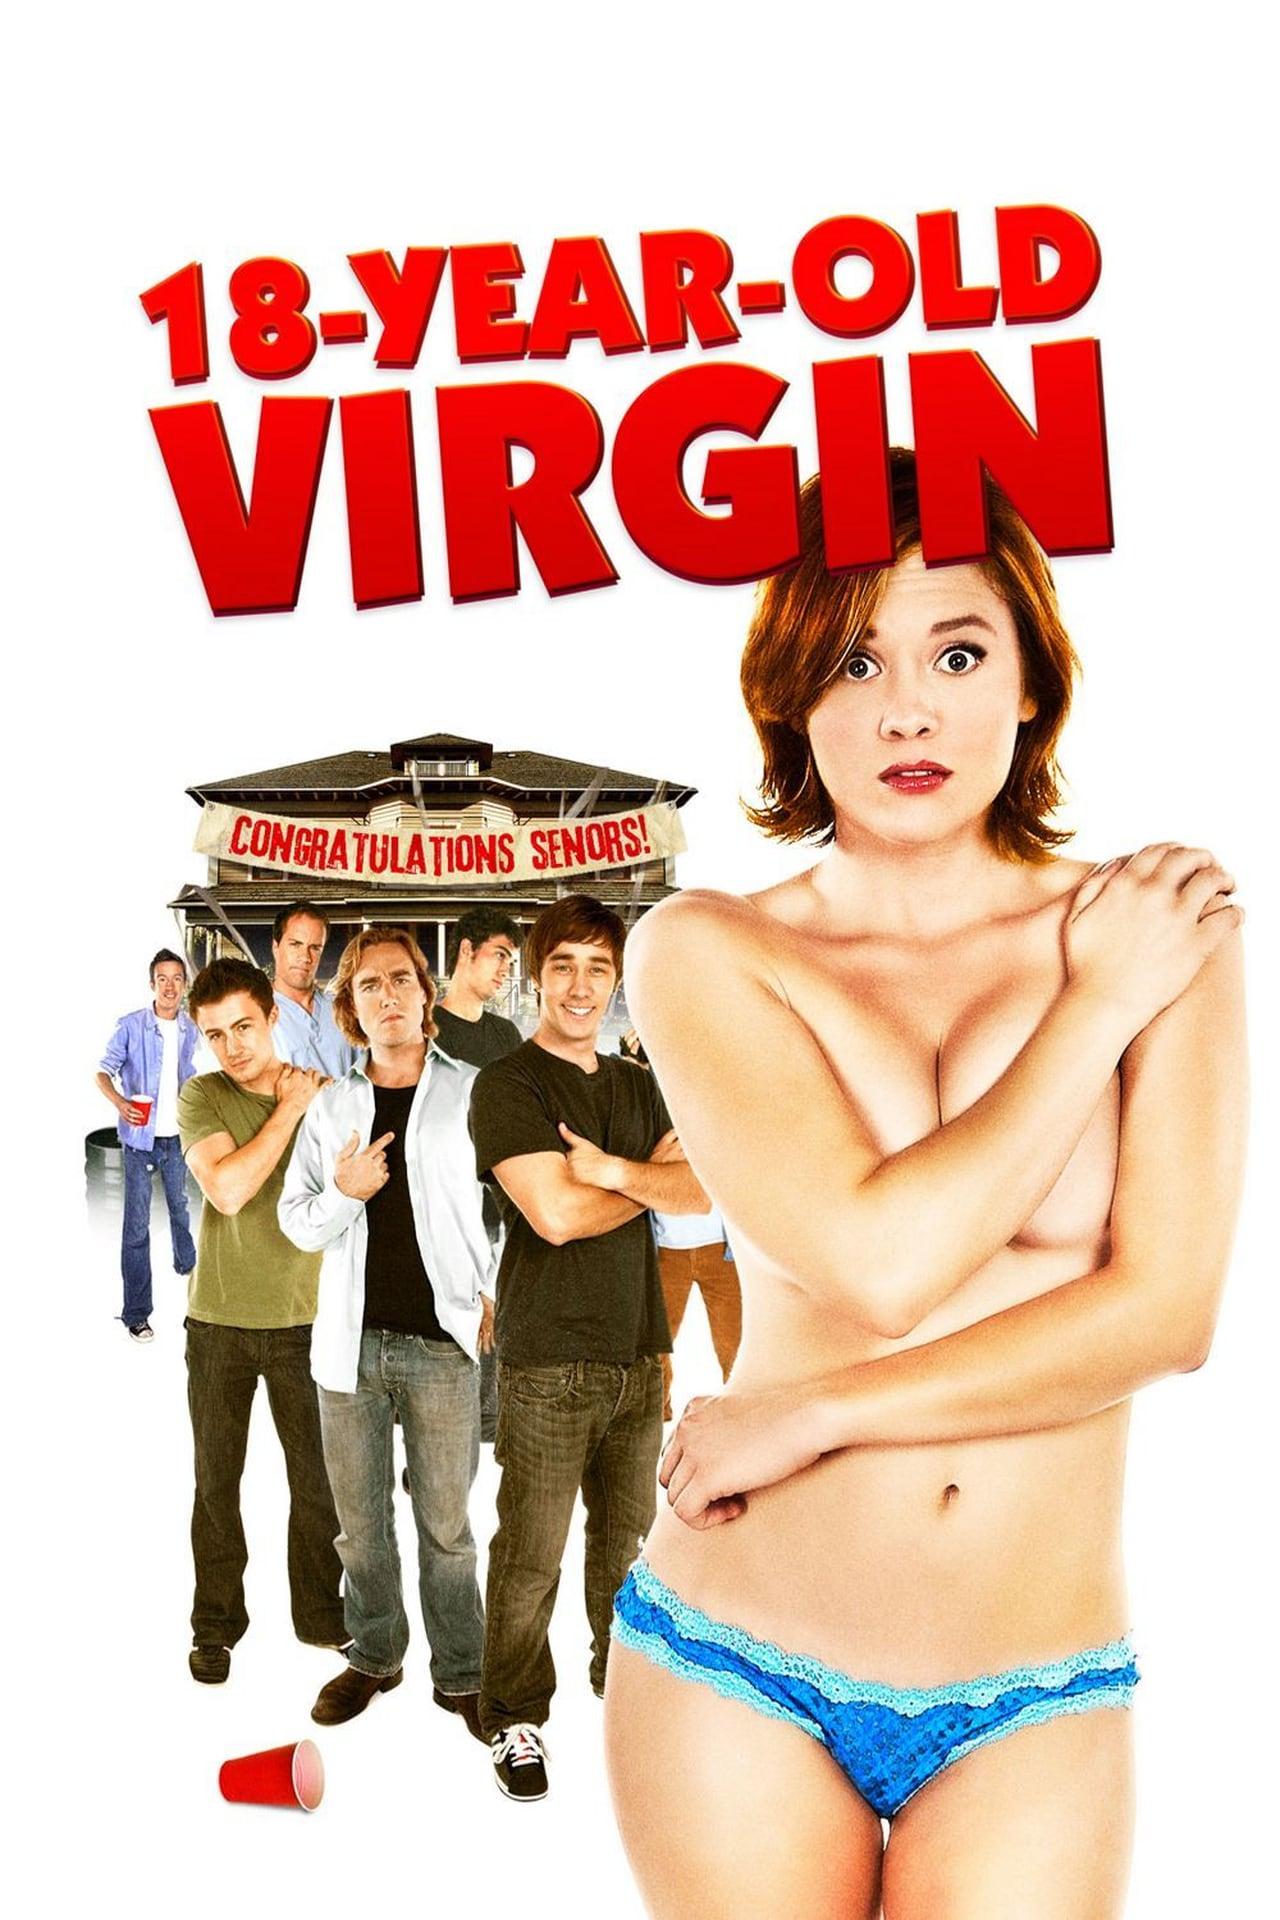 18-Year-Old Virgin kapak